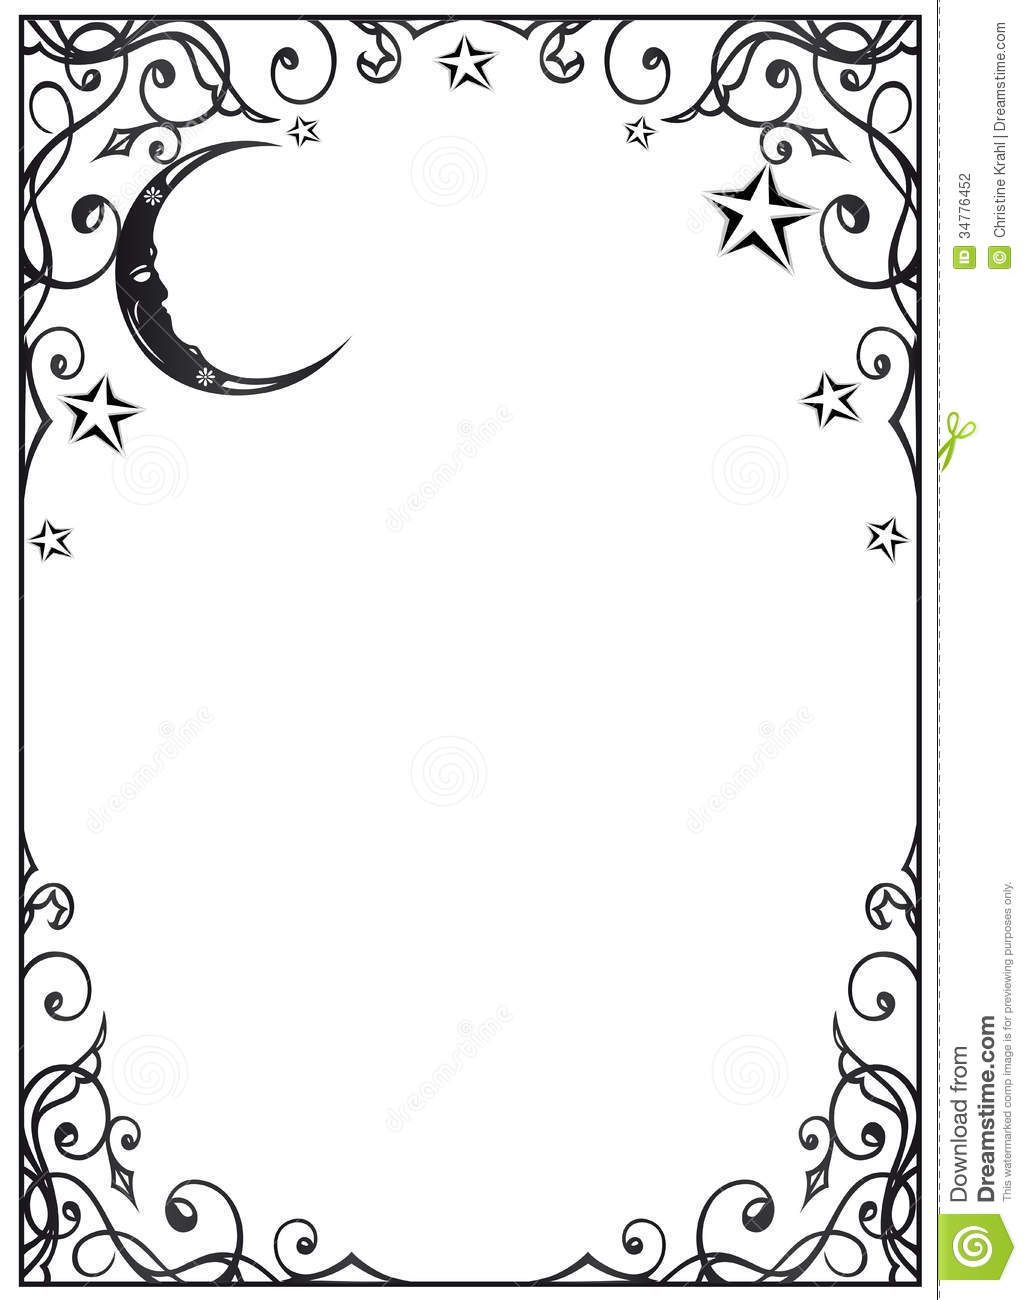 Moon stars filigree frame 1027 1300 Coloring book of shadows